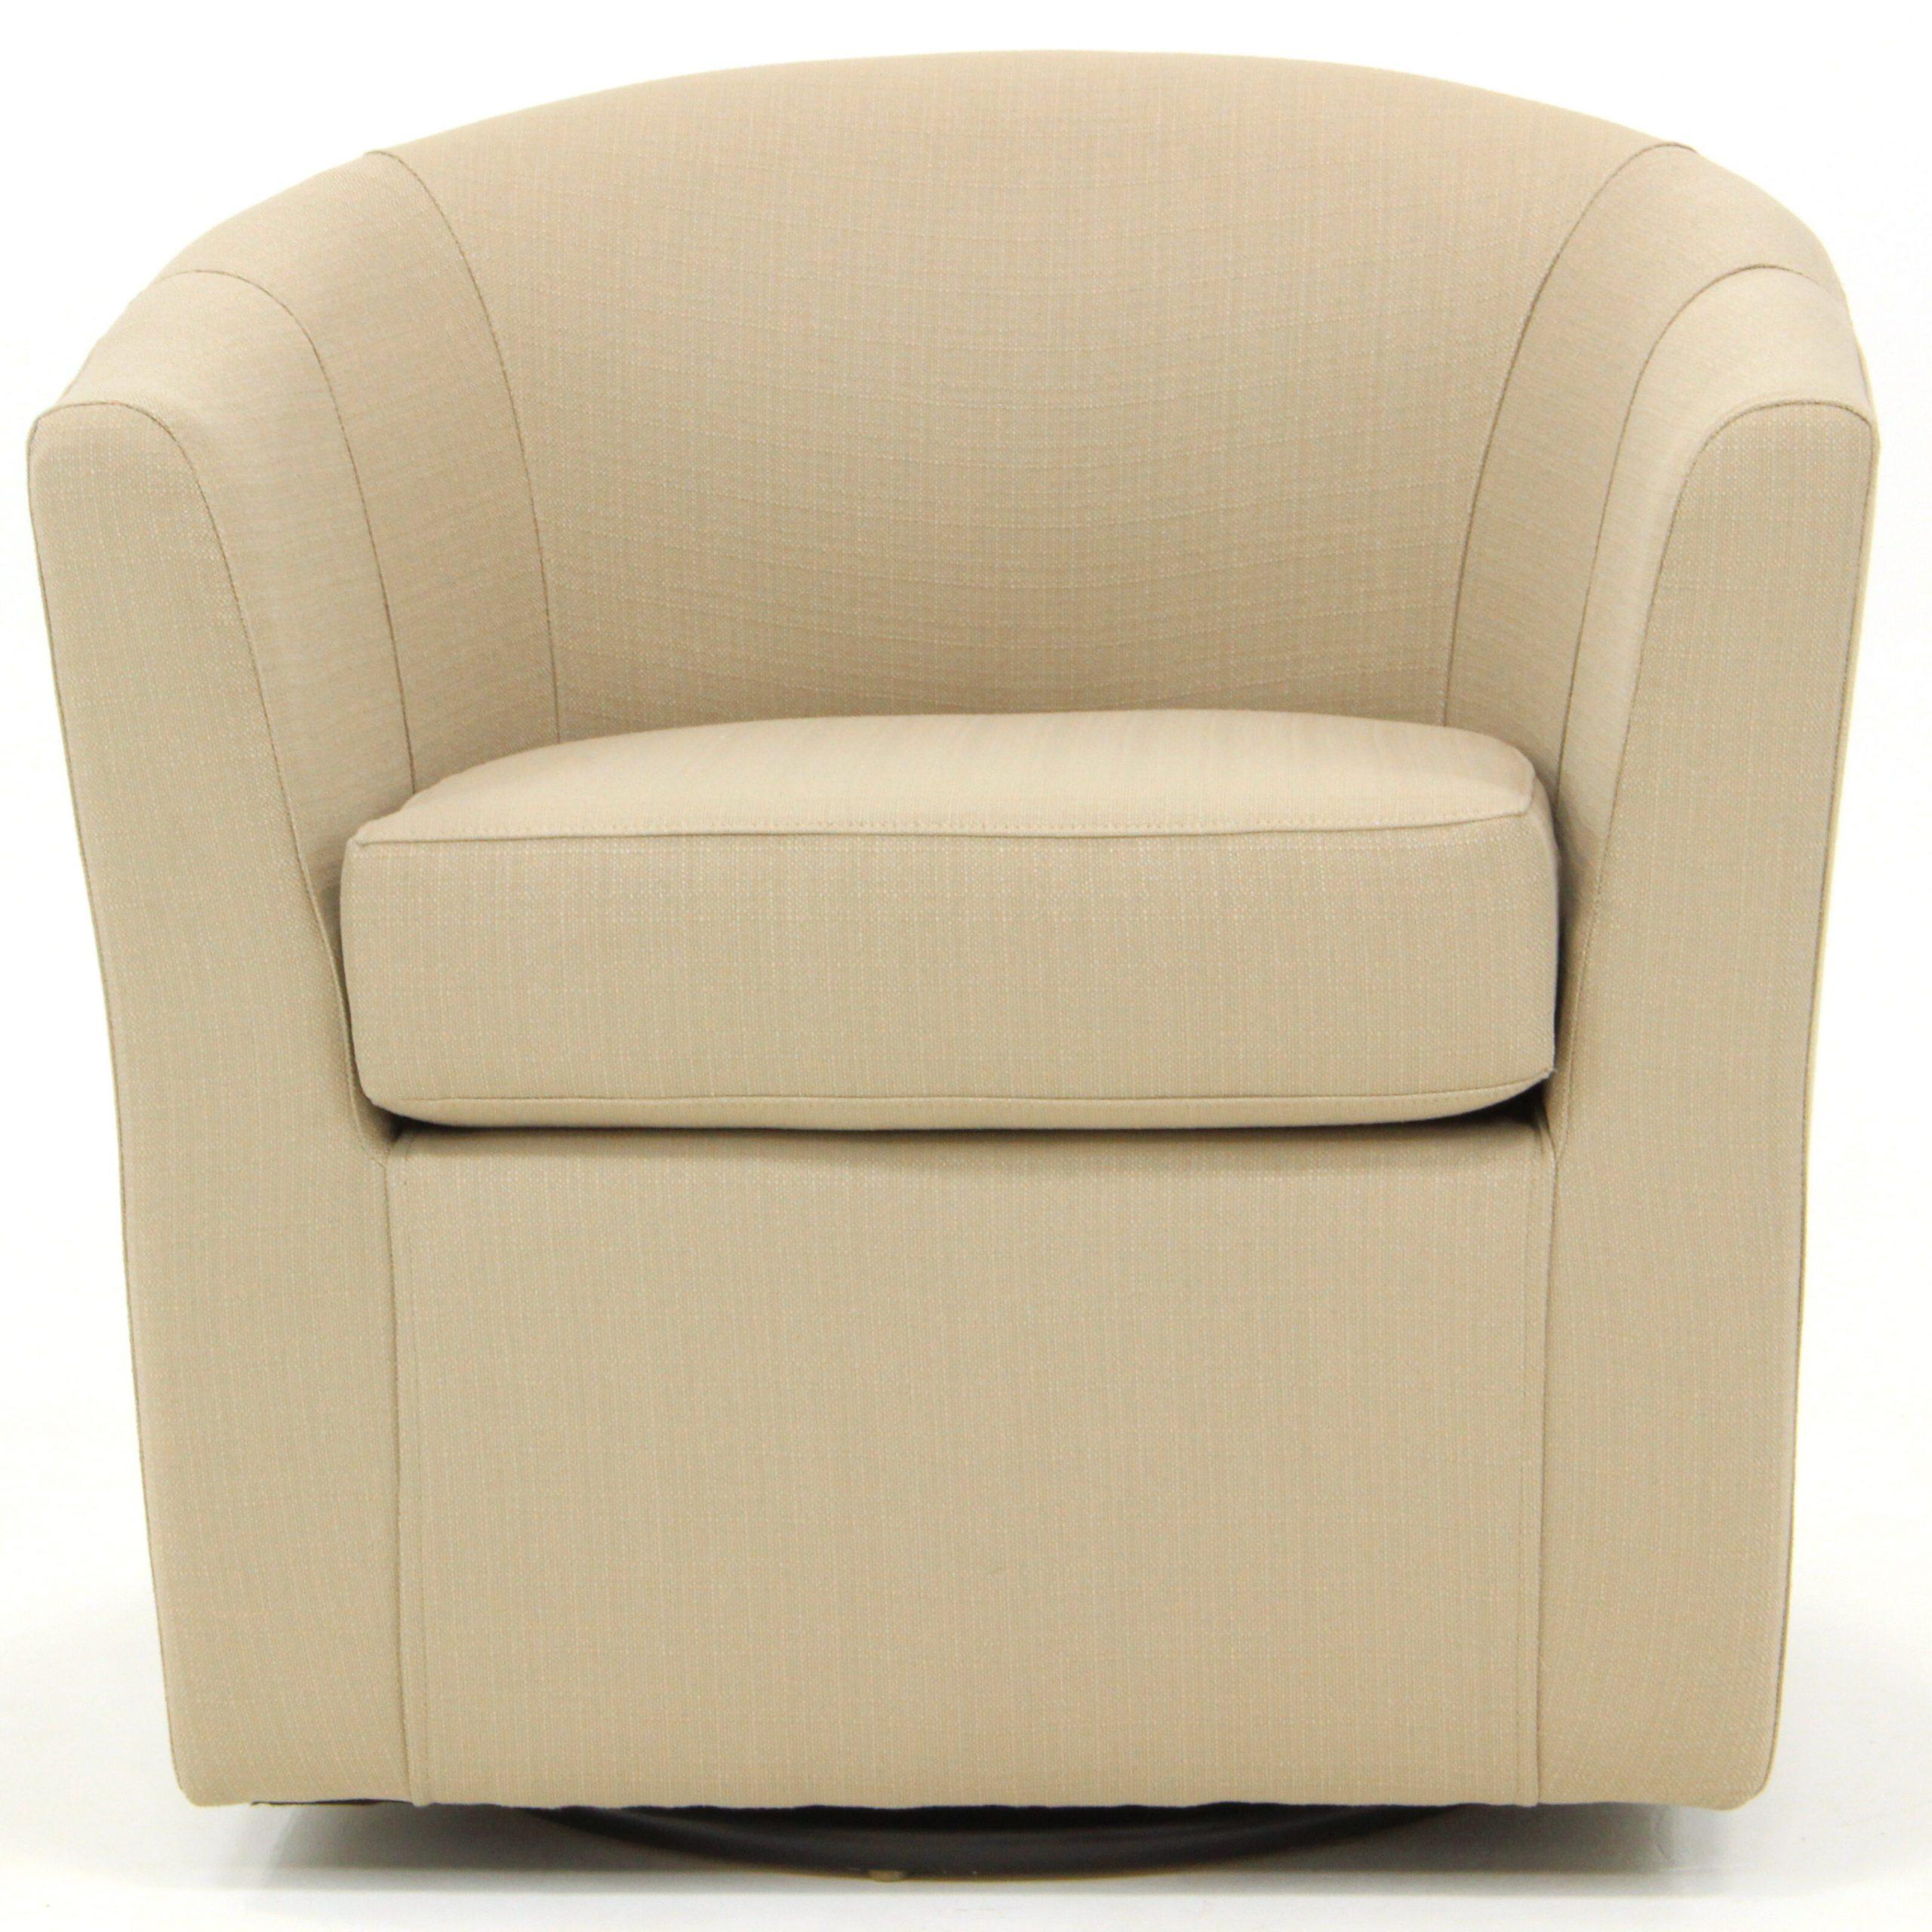 Molinari Swivel Barrel Chair Regarding Molinari Swivel Barrel Chairs (View 3 of 15)